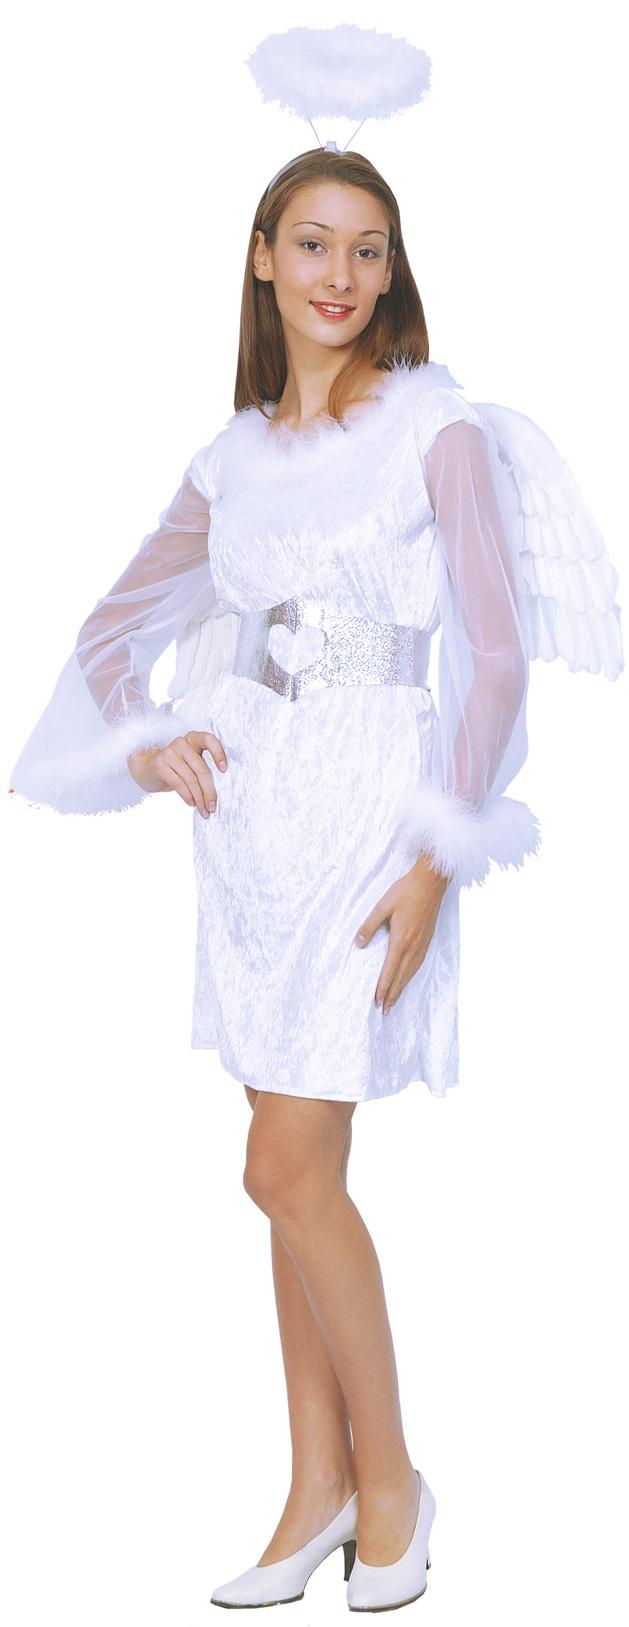 Déguisement ange noel femme   Robe ange blanche noel 4a272c4e7ab0